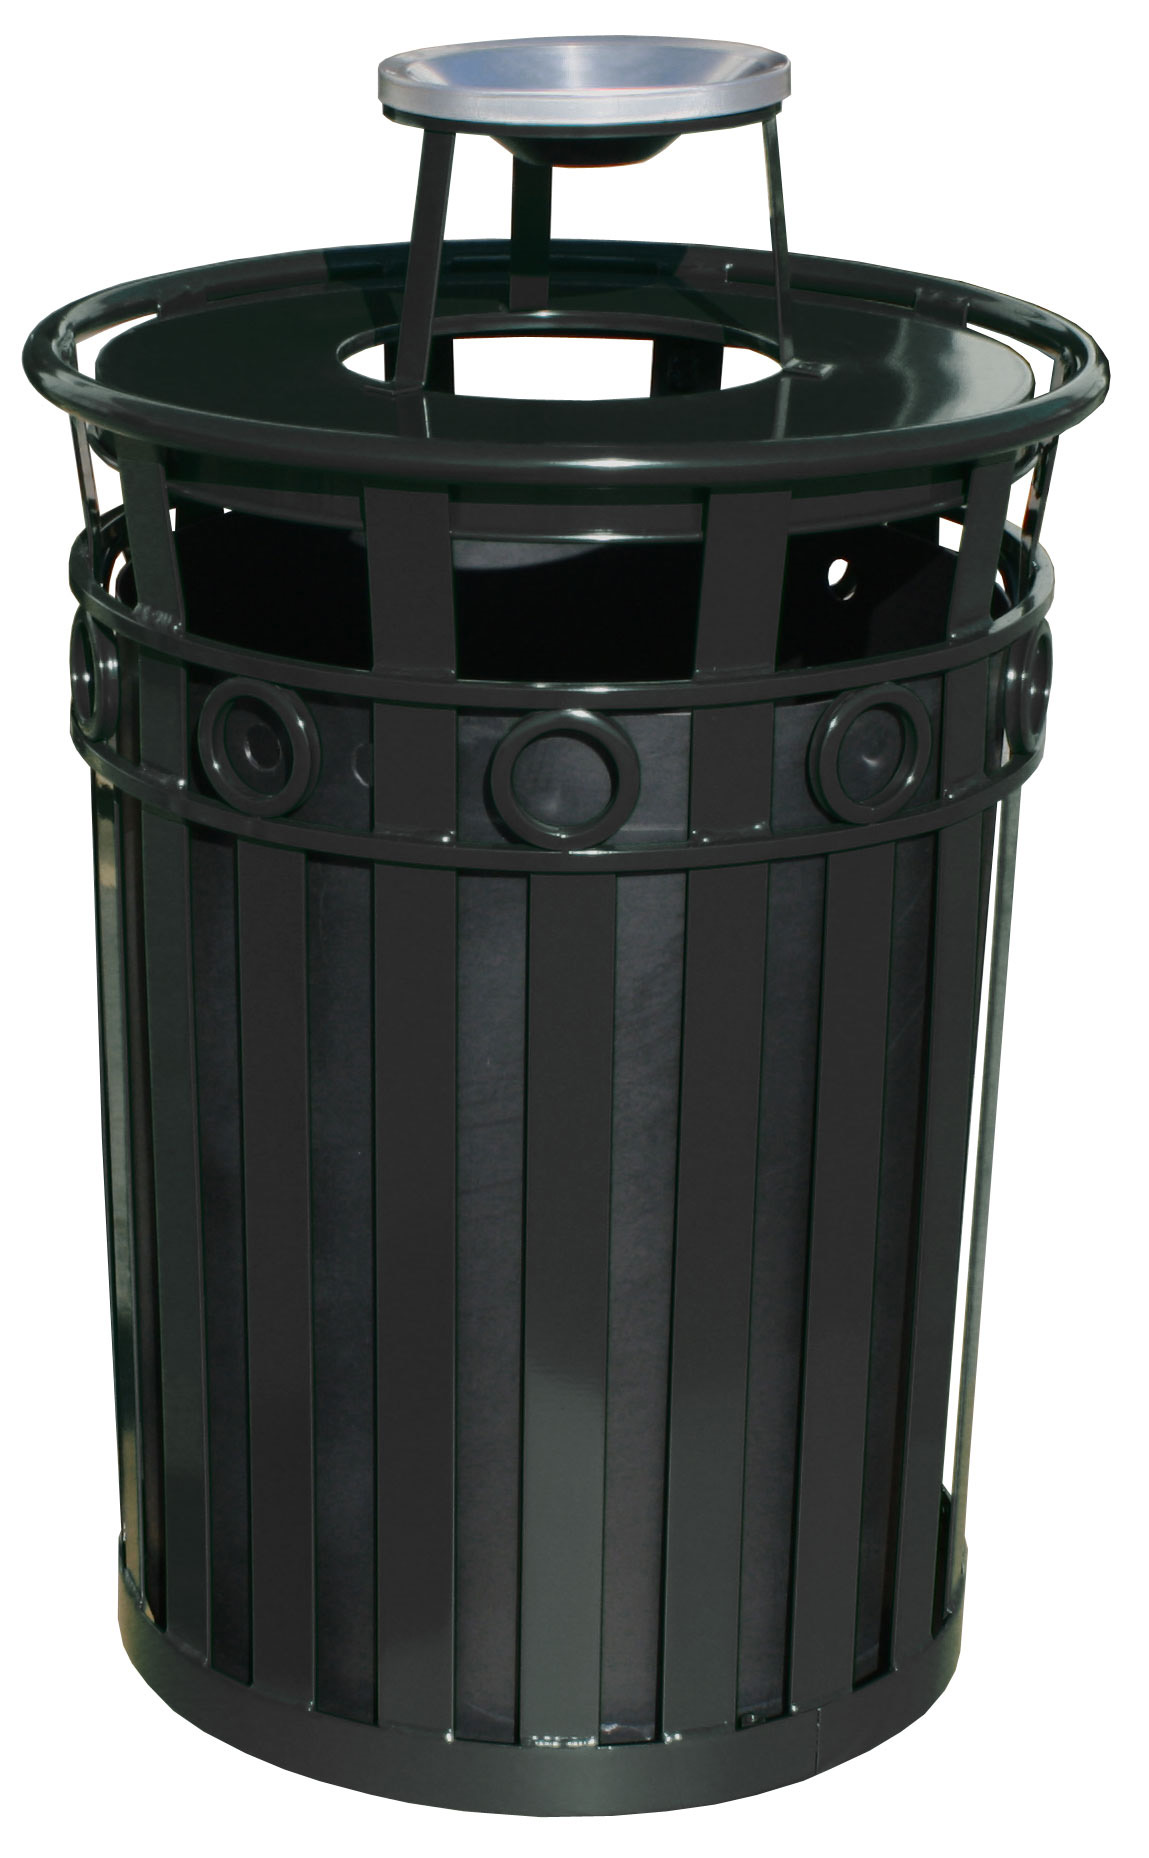 Witt Industries M3600-R-AT-BK 40-Gallon Outdoor Flat Bar Trash Can w/ Ash Top Lid, Black